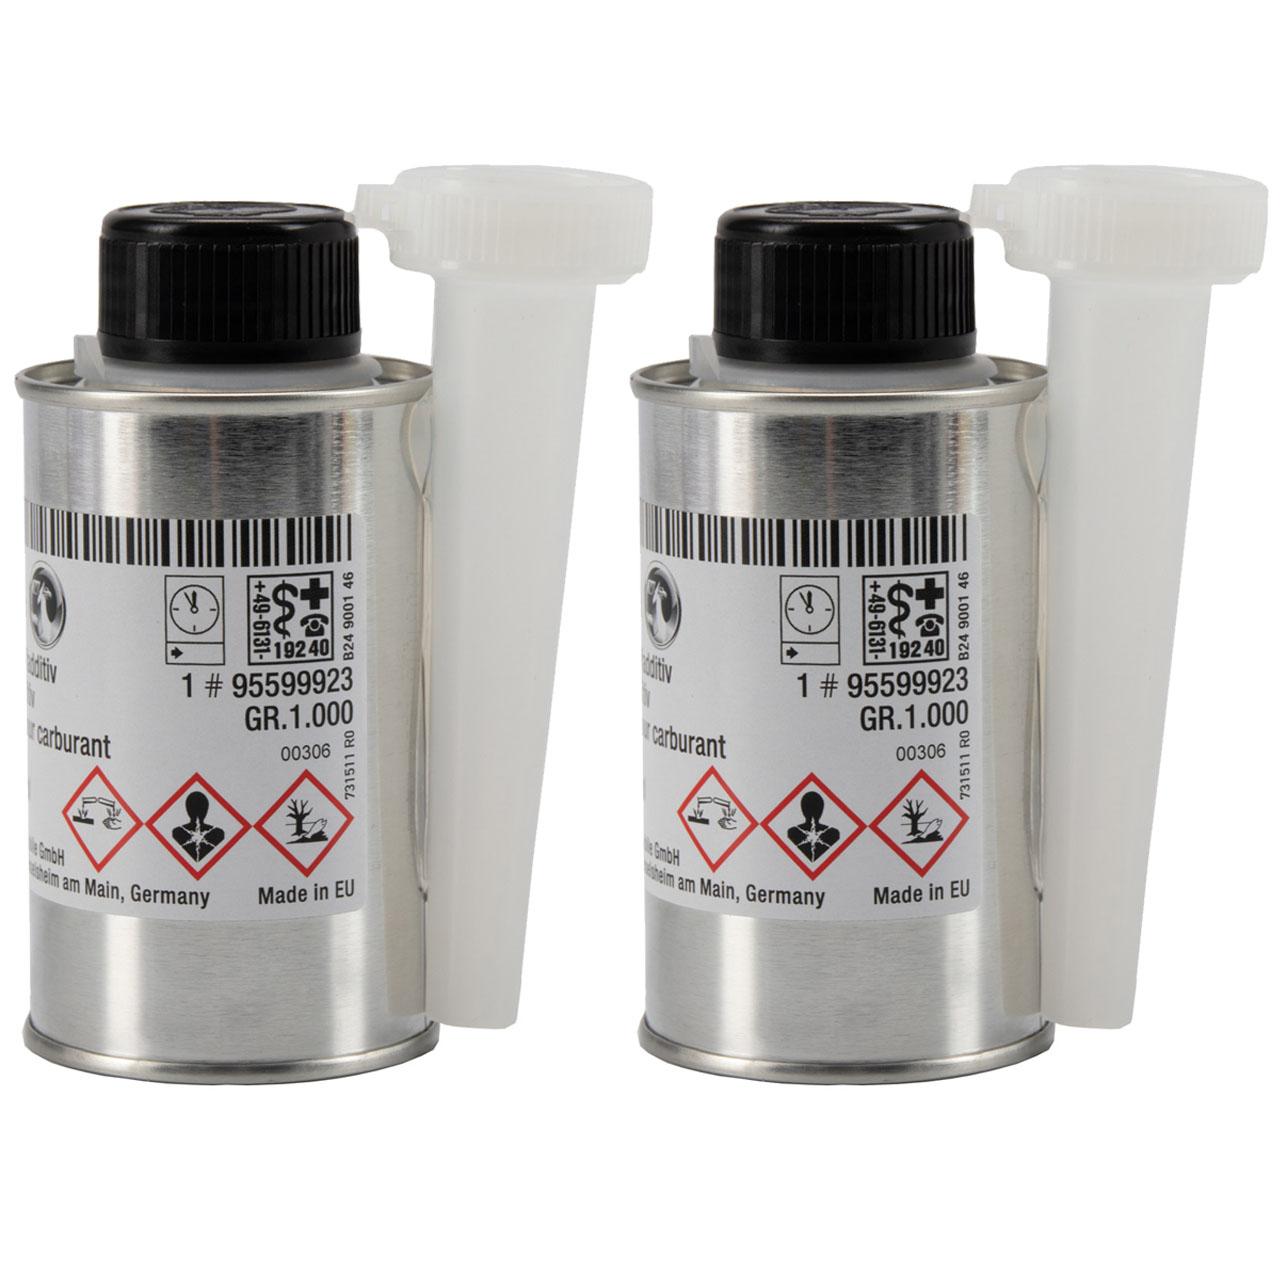 2x ORIGINAL Opel Kraftstoffadditiv Benzinadditiv Additiv 120ml 95599923